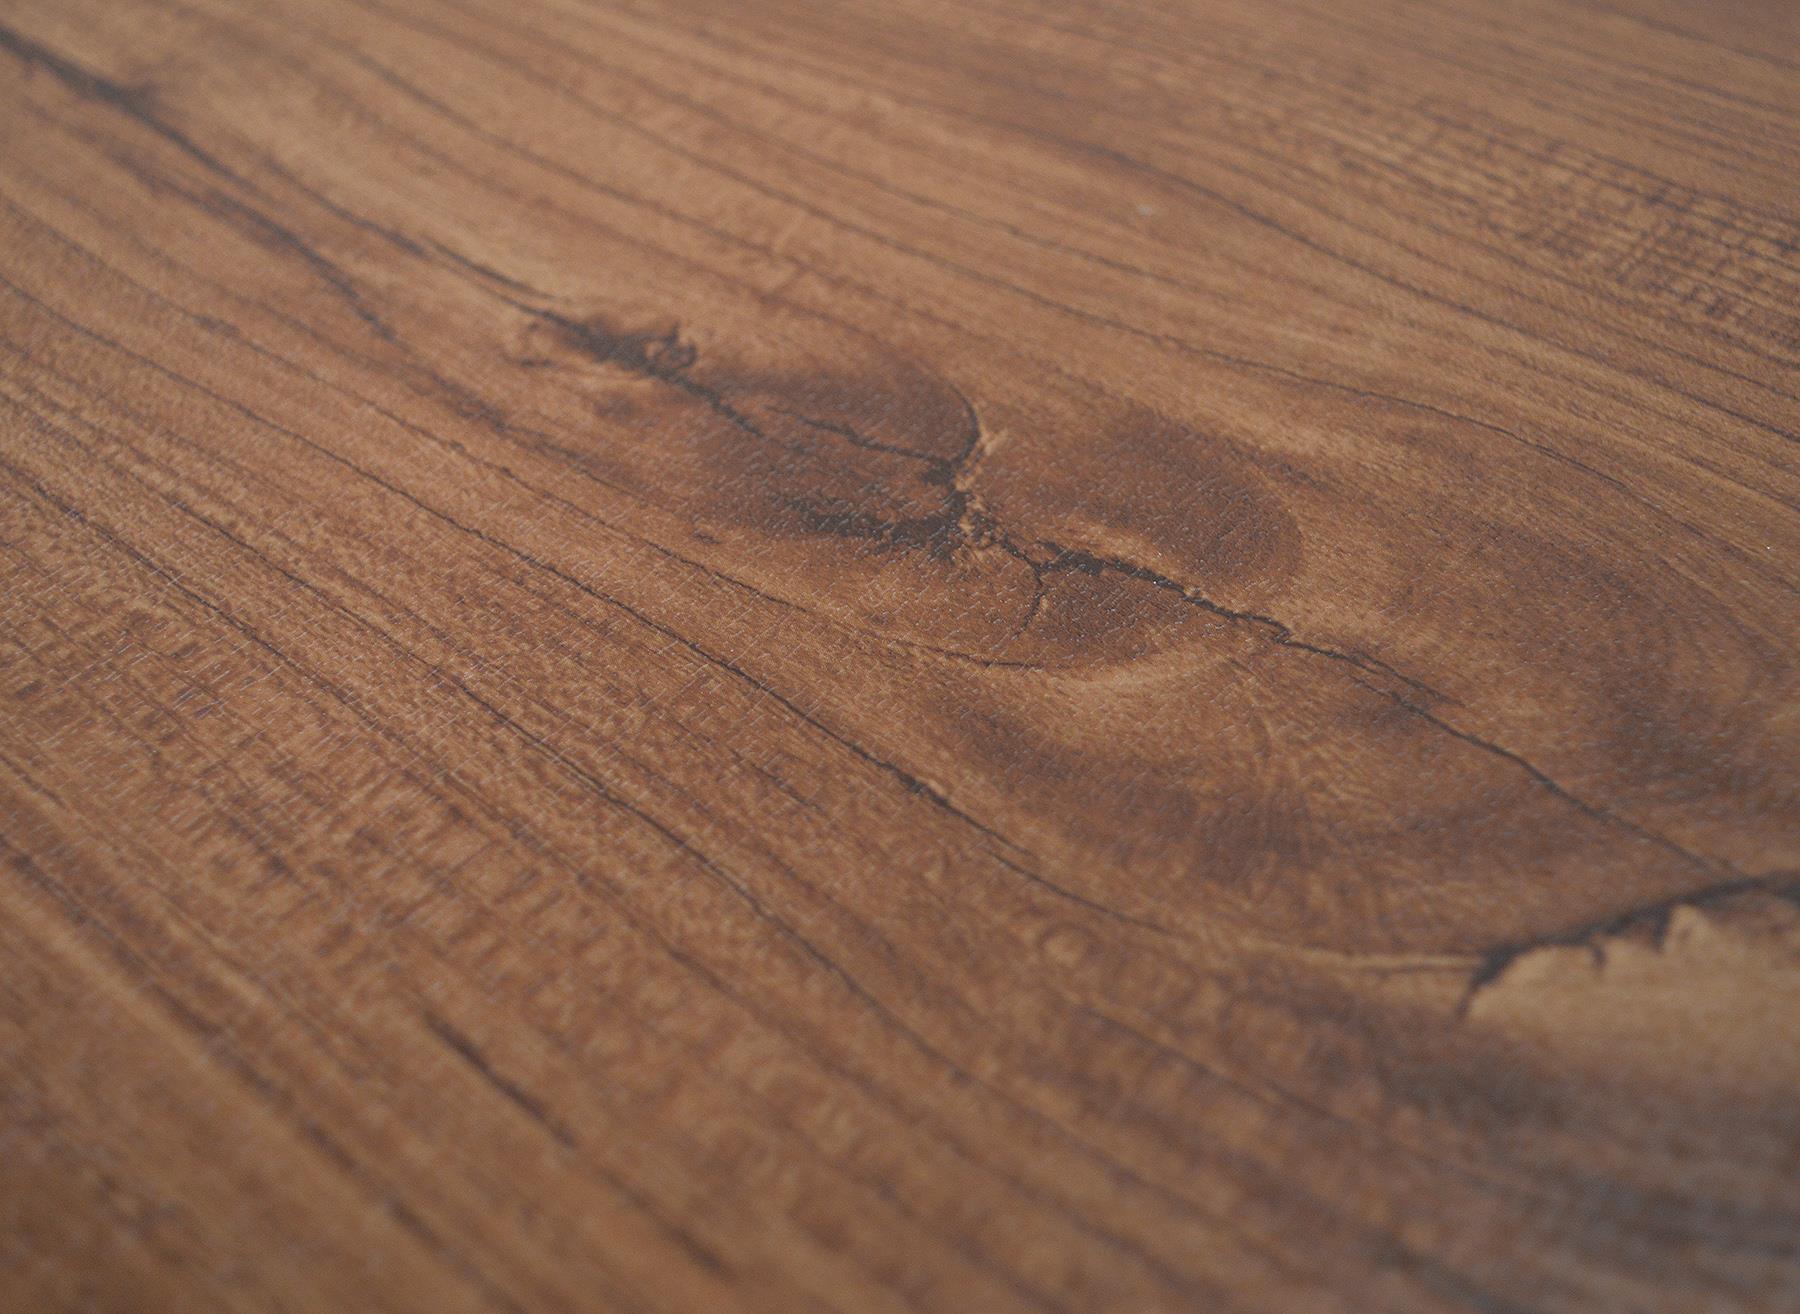 Floor-Tiles-Self-Adhesive-Vinyl-Flooring-Kitchen-Bathroom-Brown-Wood-Grain thumbnail 5